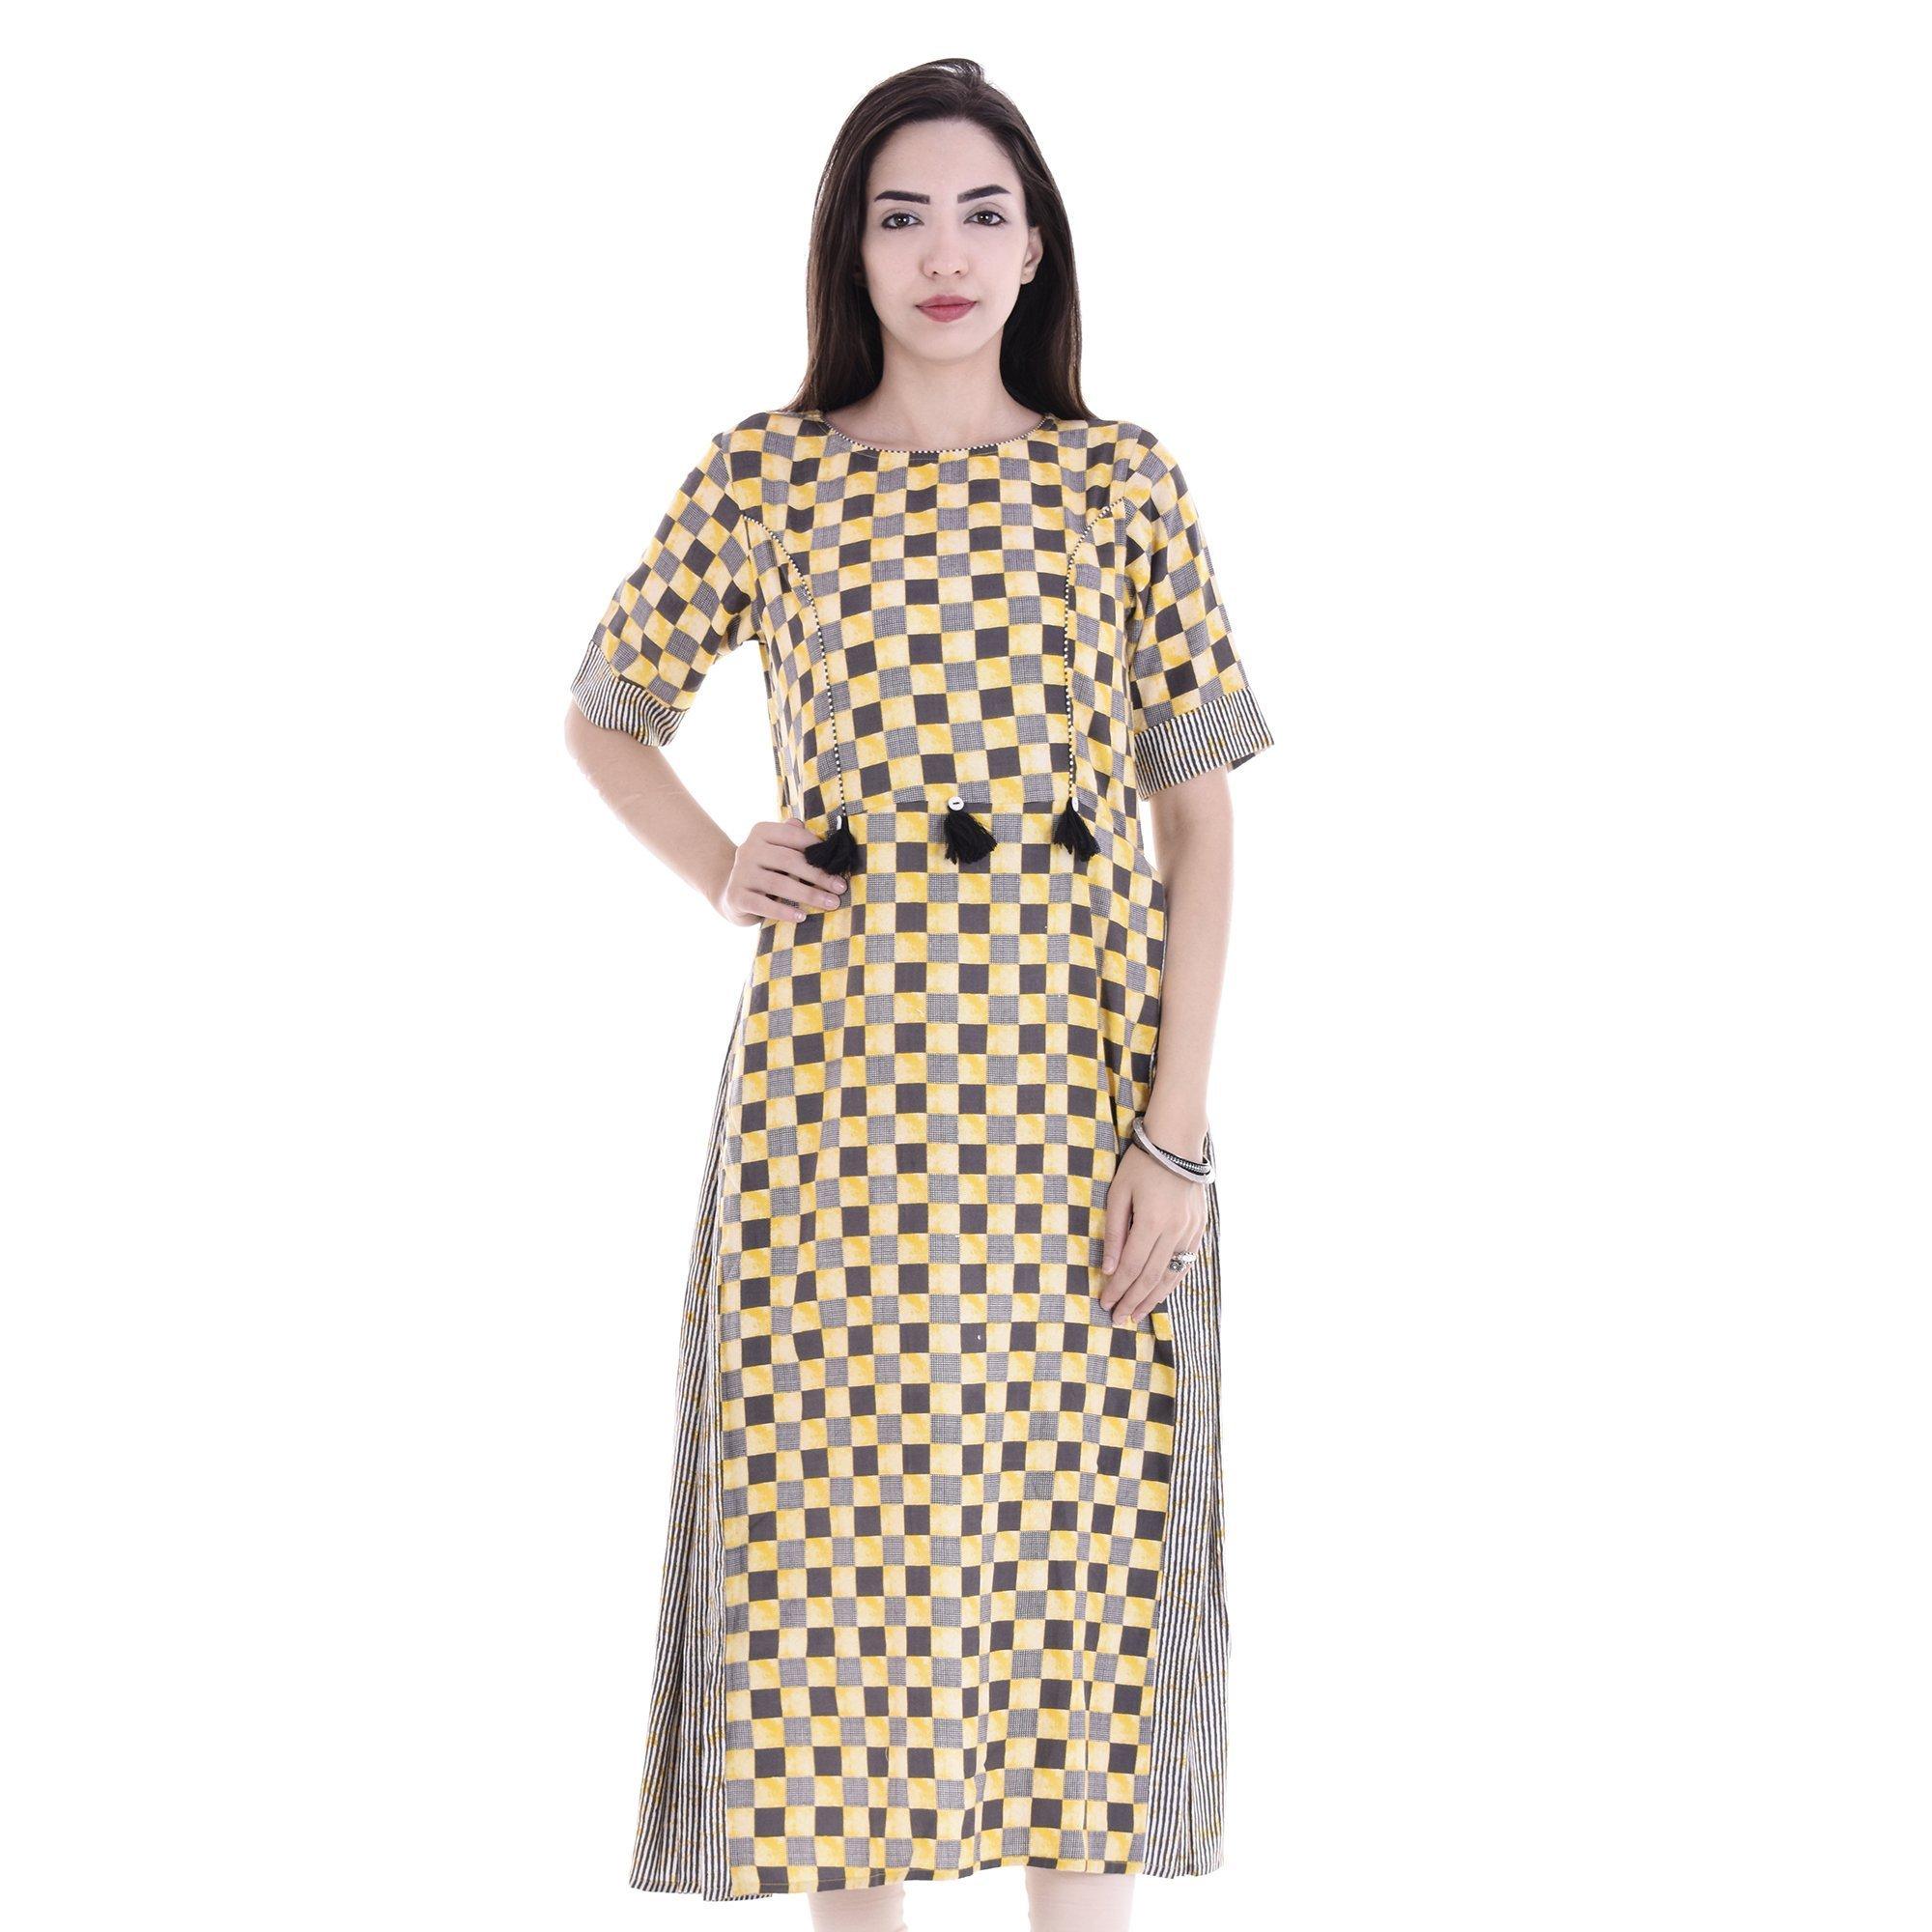 Chichi Indian Women Kurta Kurti 3/4 Sleeve XX-Large Size Checkered Round Multi-Colored Top